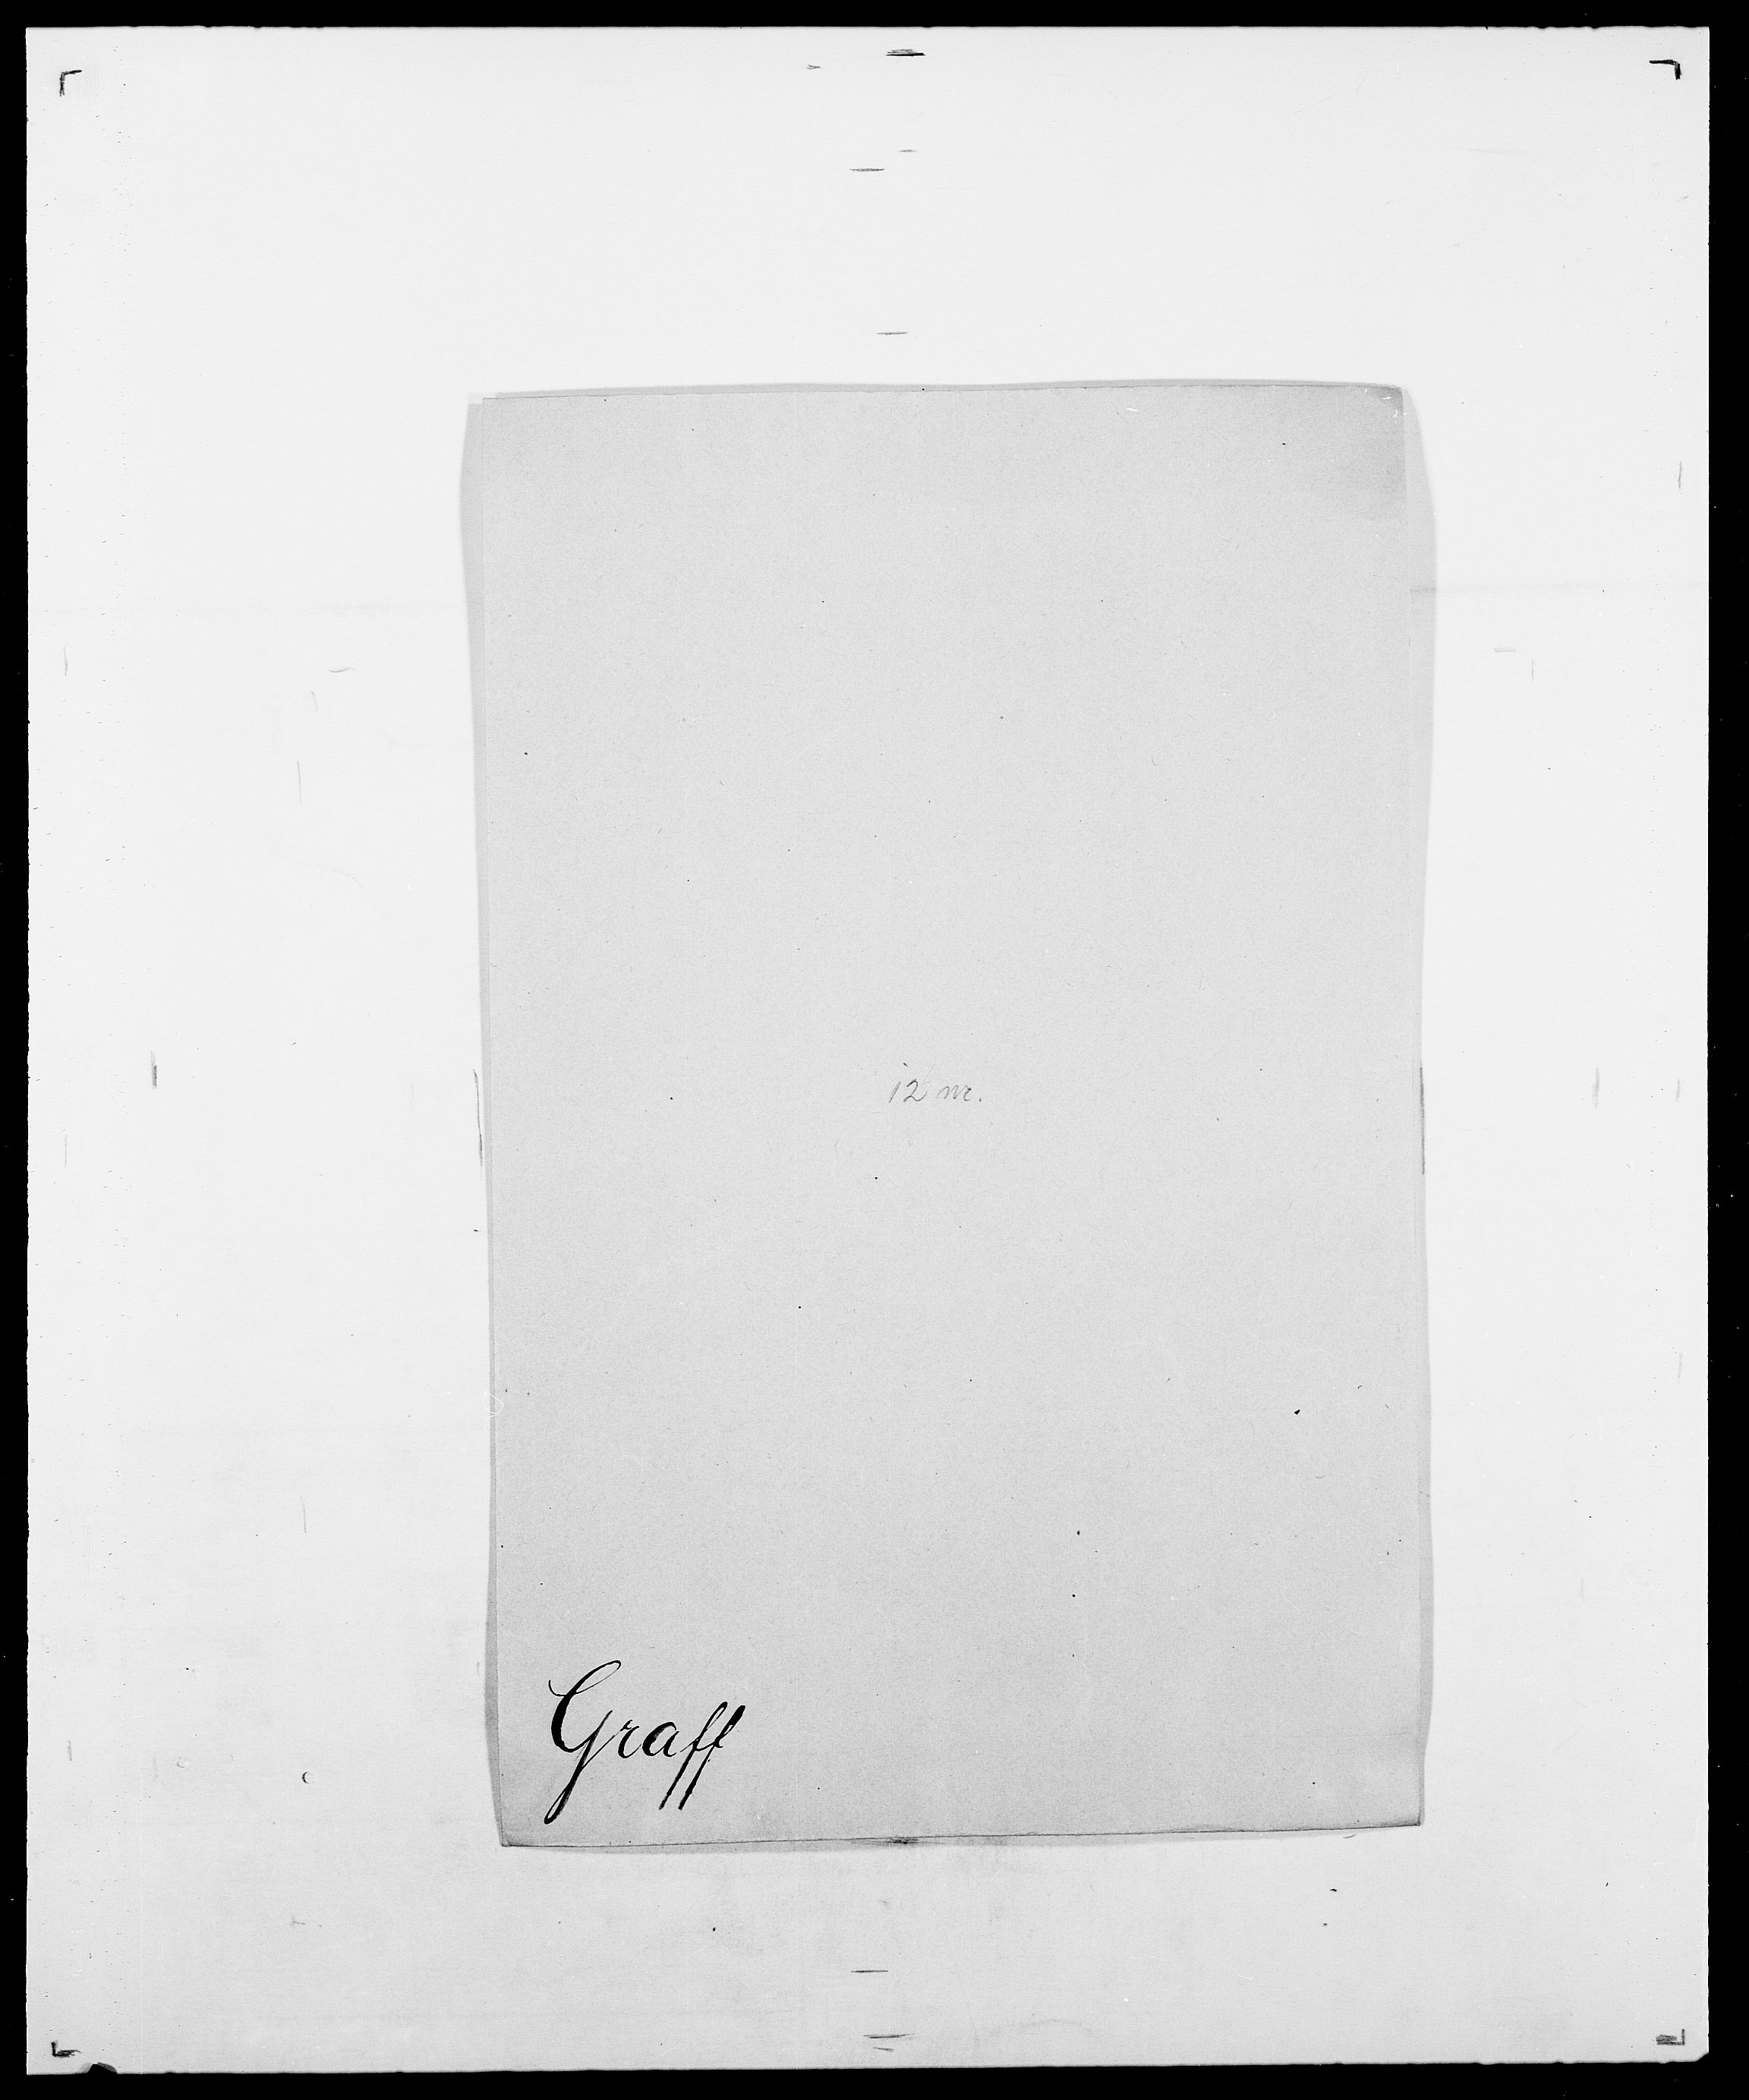 SAO, Delgobe, Charles Antoine - samling, D/Da/L0014: Giebdhausen - Grip, s. 457